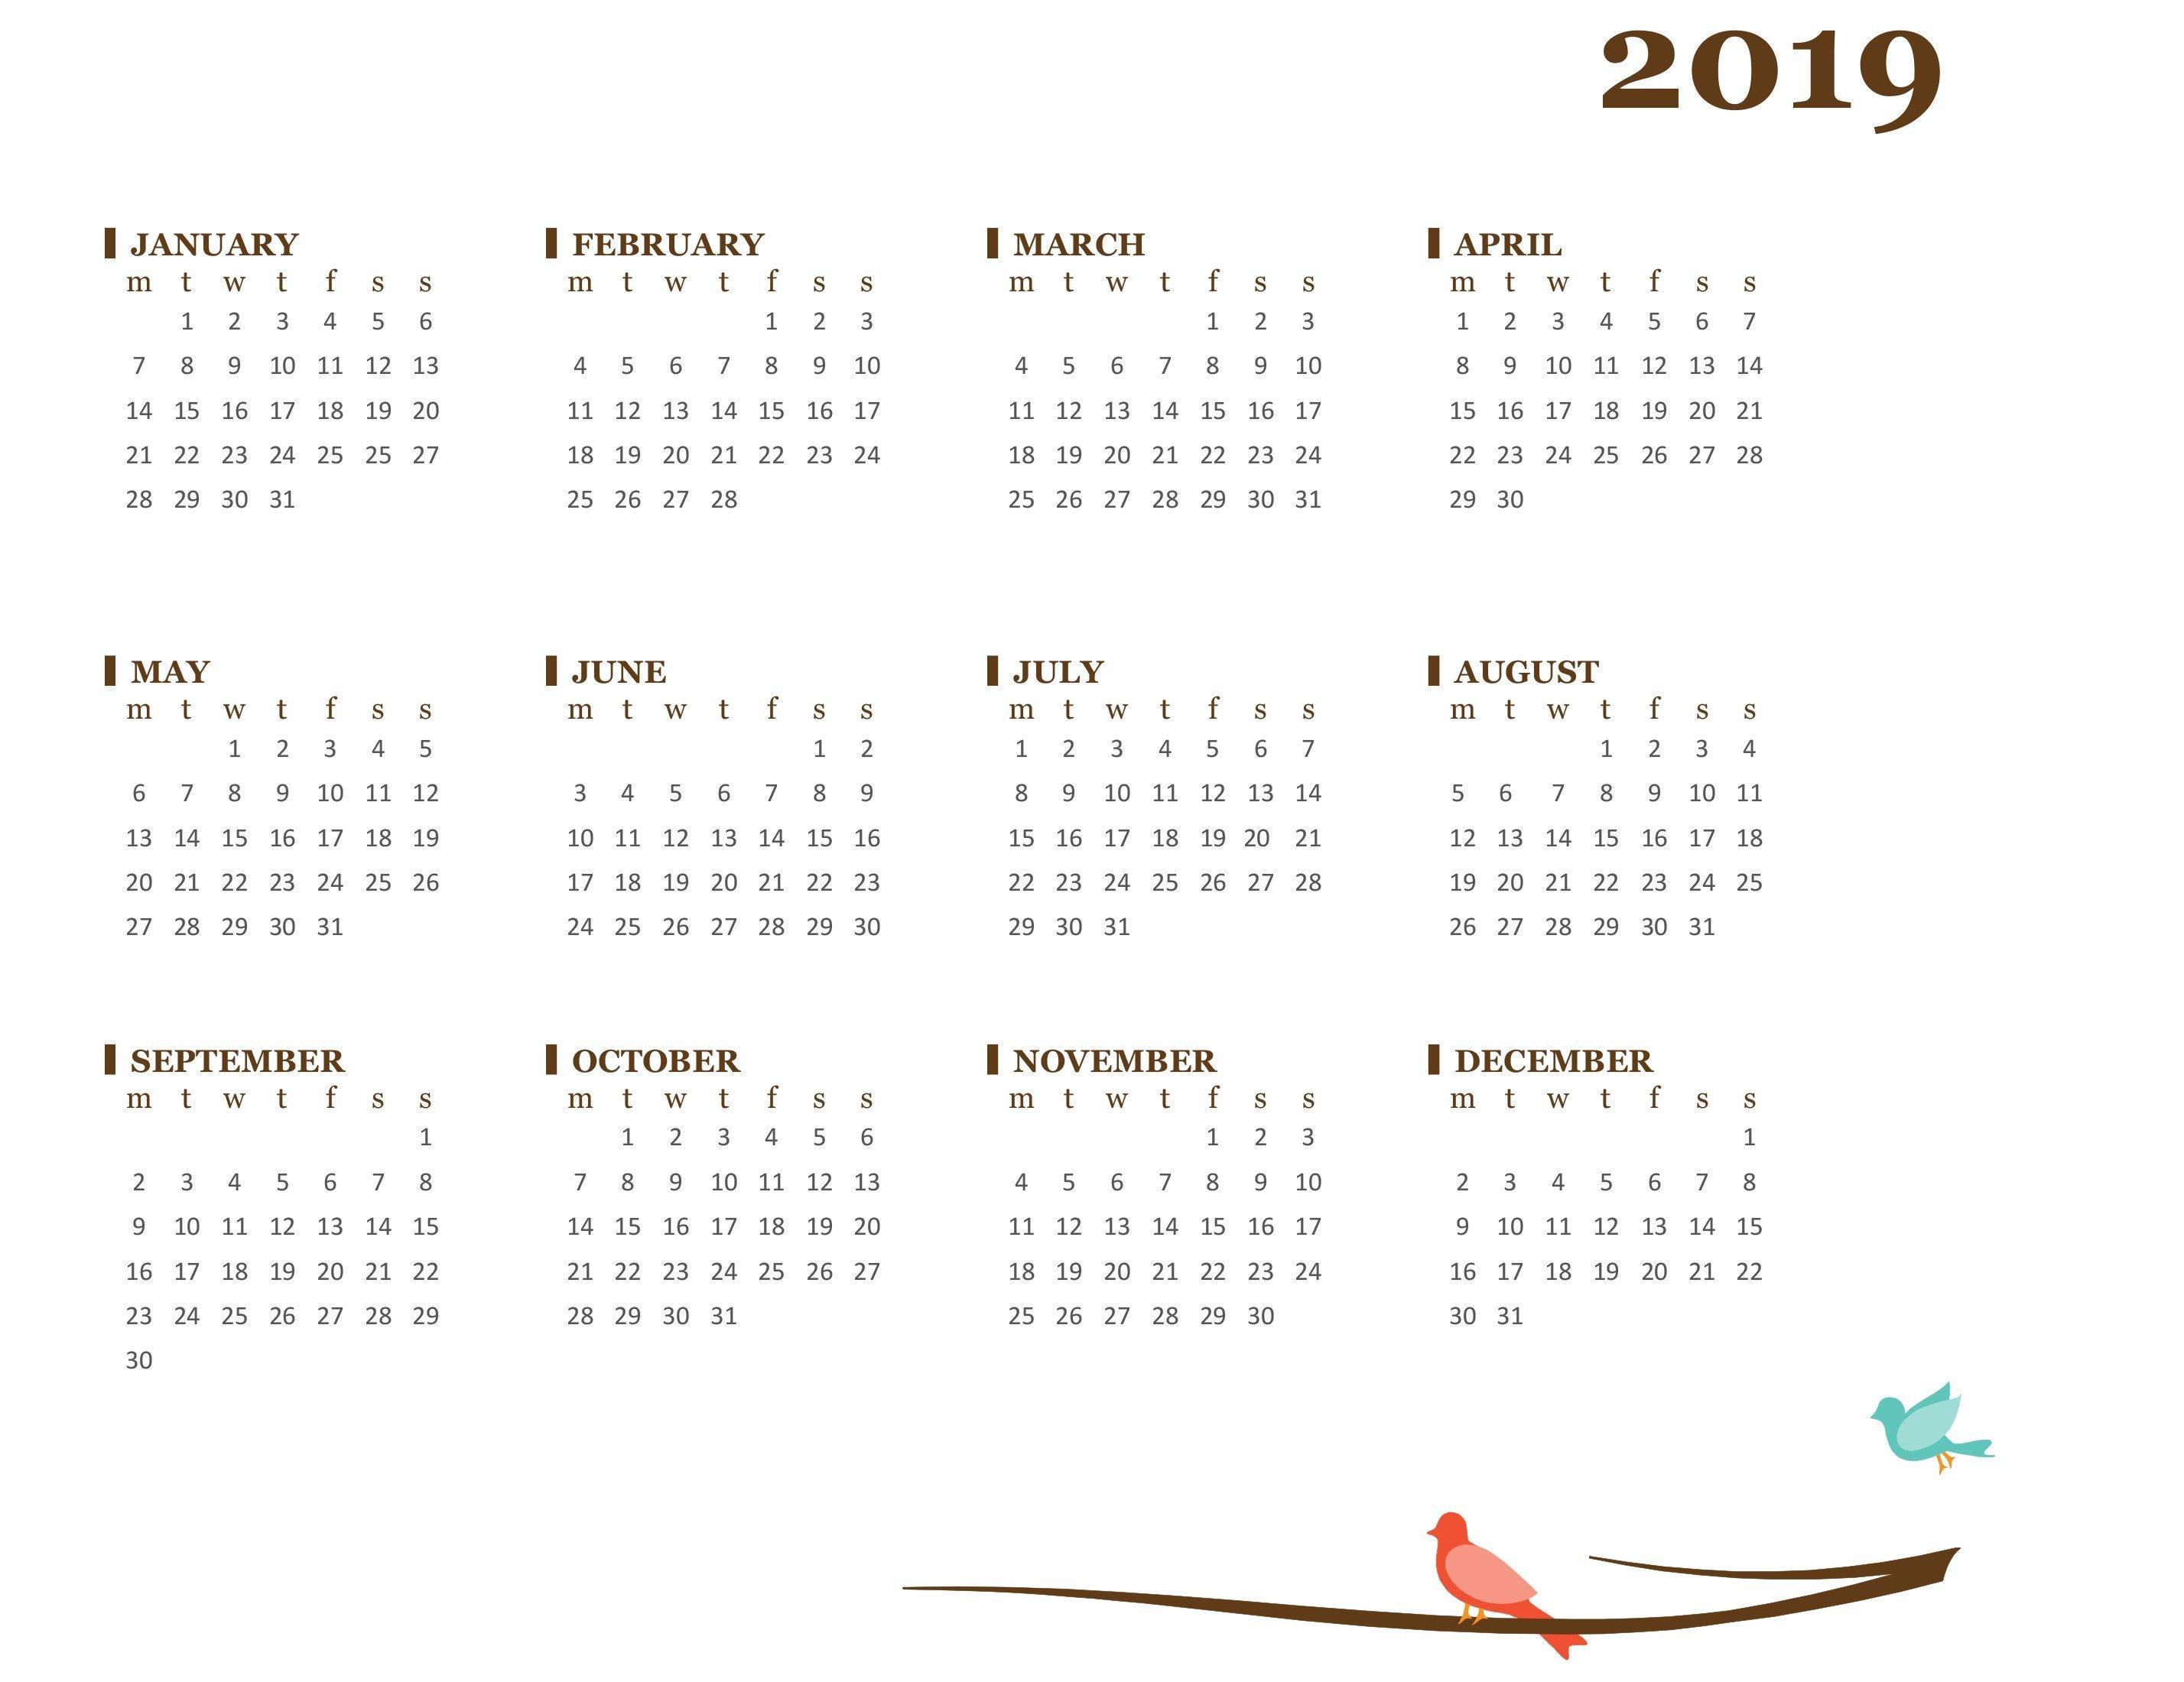 2019 Yearly Calendar (Mon-Sun) Calendar En 8 2019